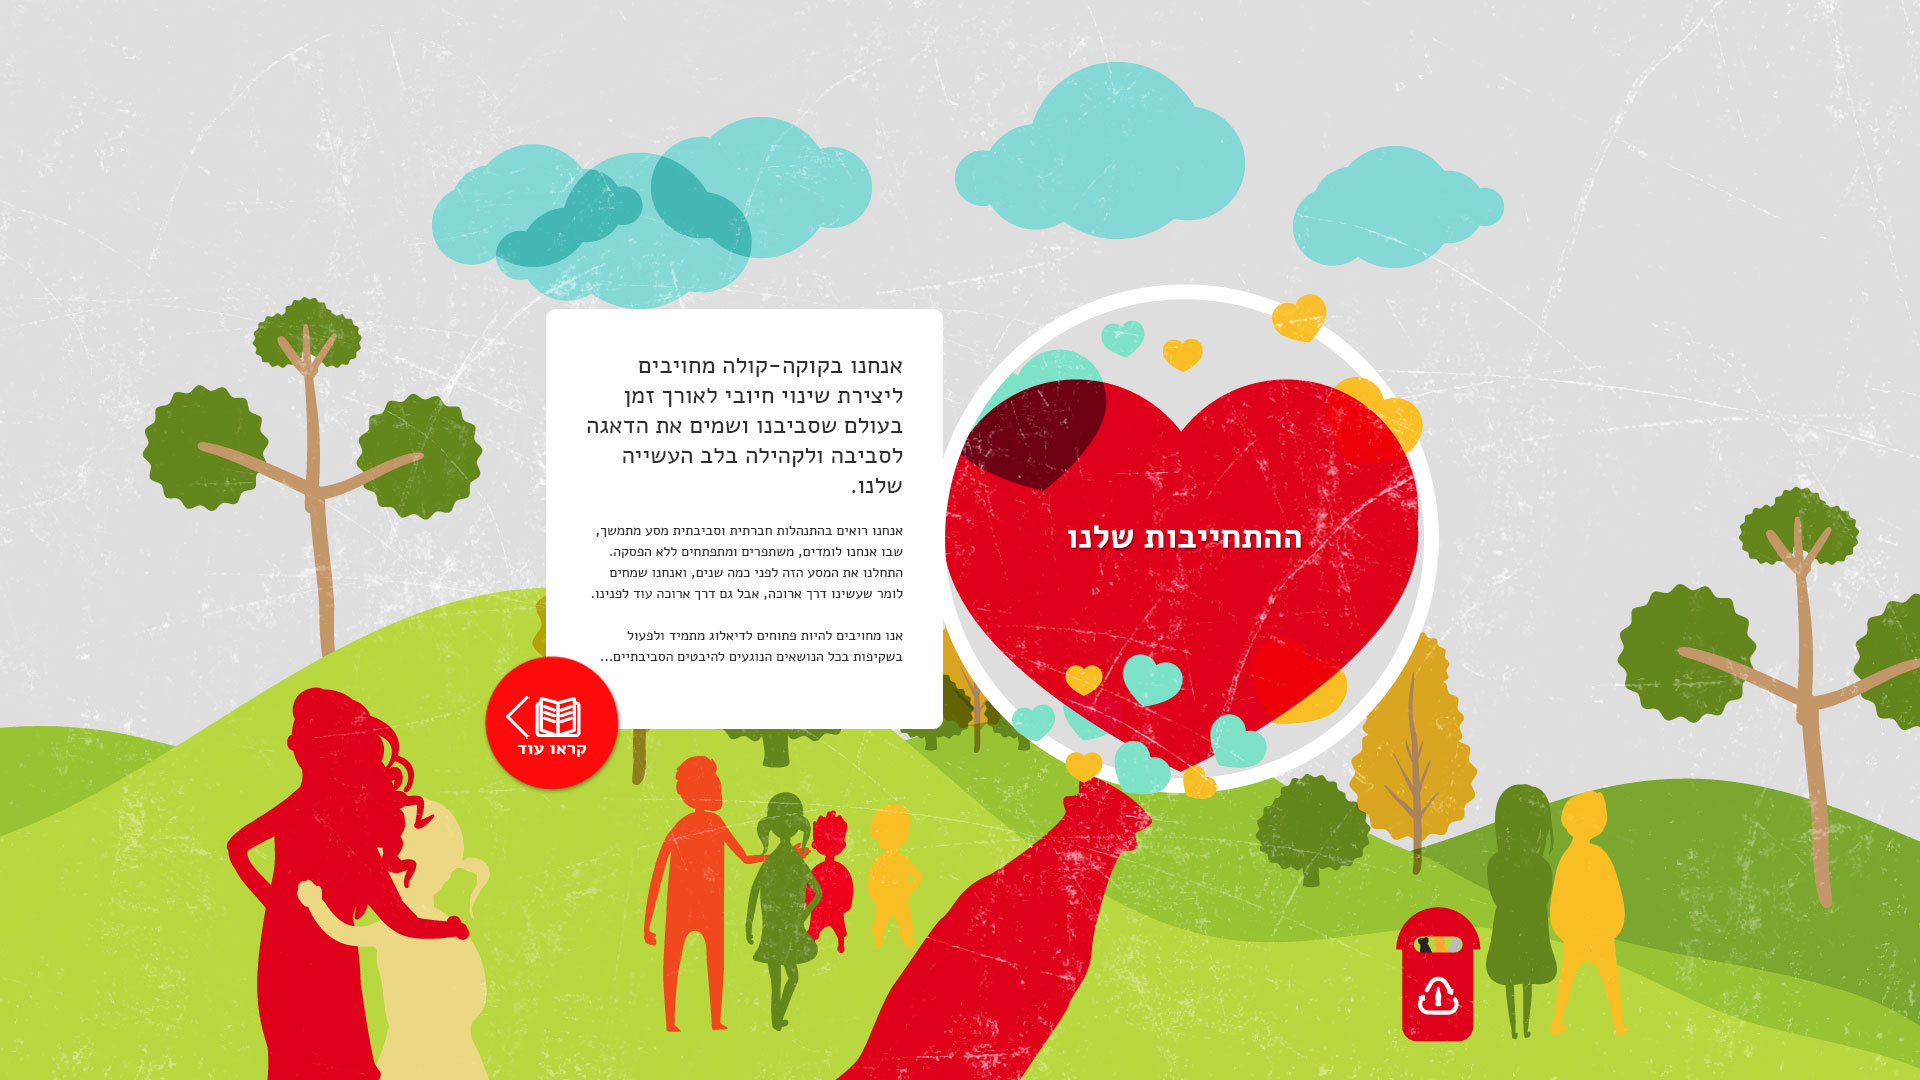 Coca Cola social responsibility website design קוקה קולה עיצוב אתר אחריות חברתית 2